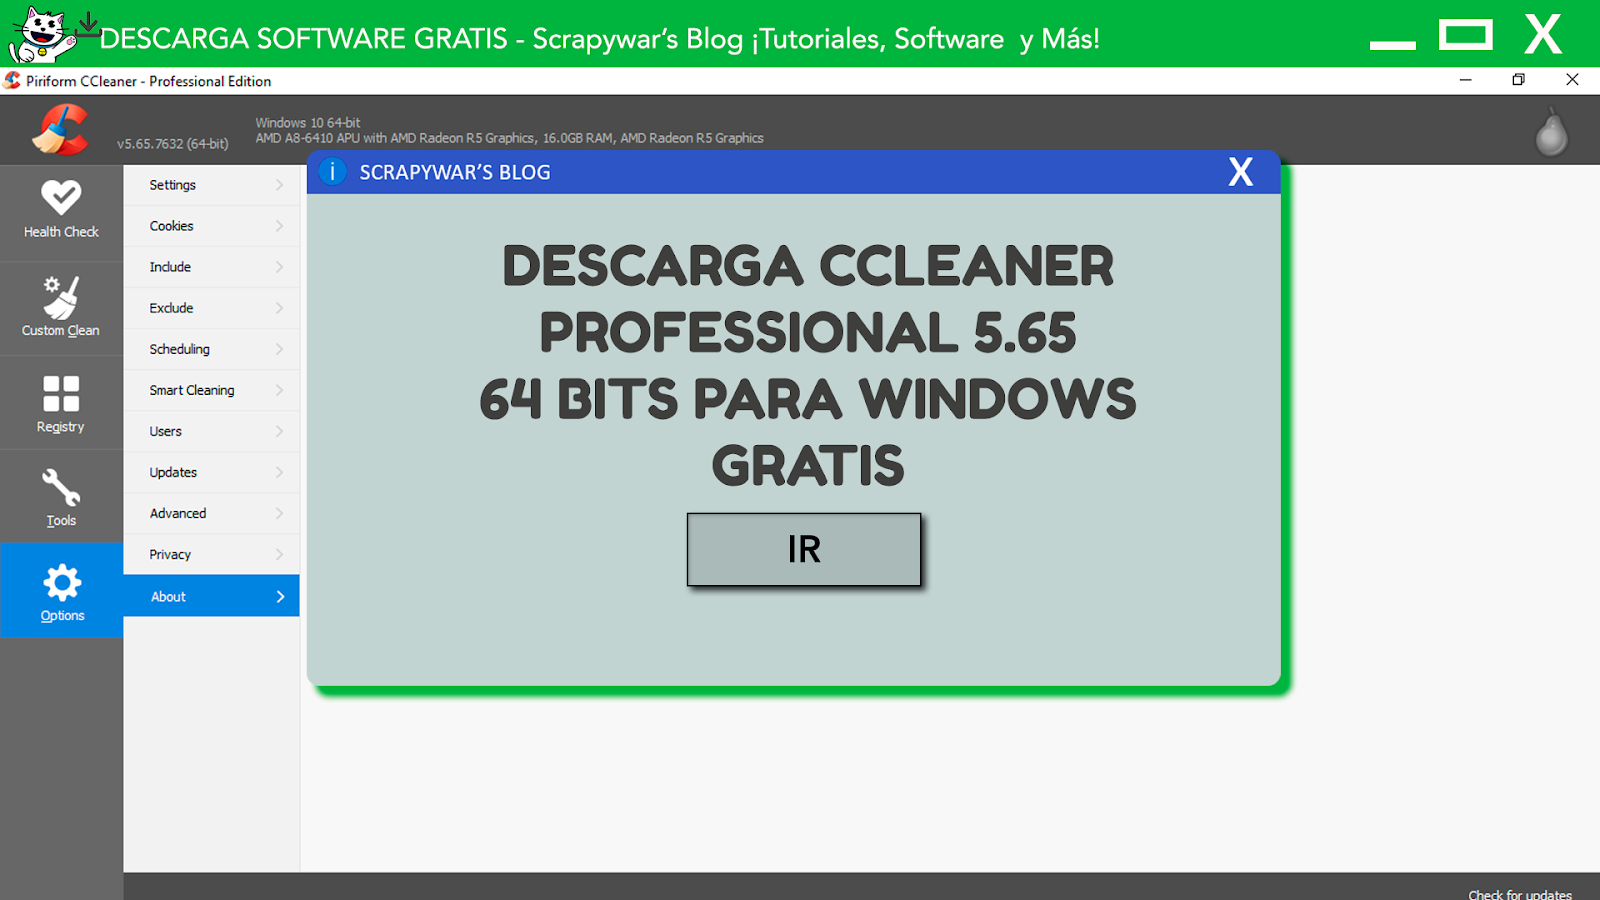 Descarga CCleaner 5.65 Gratis